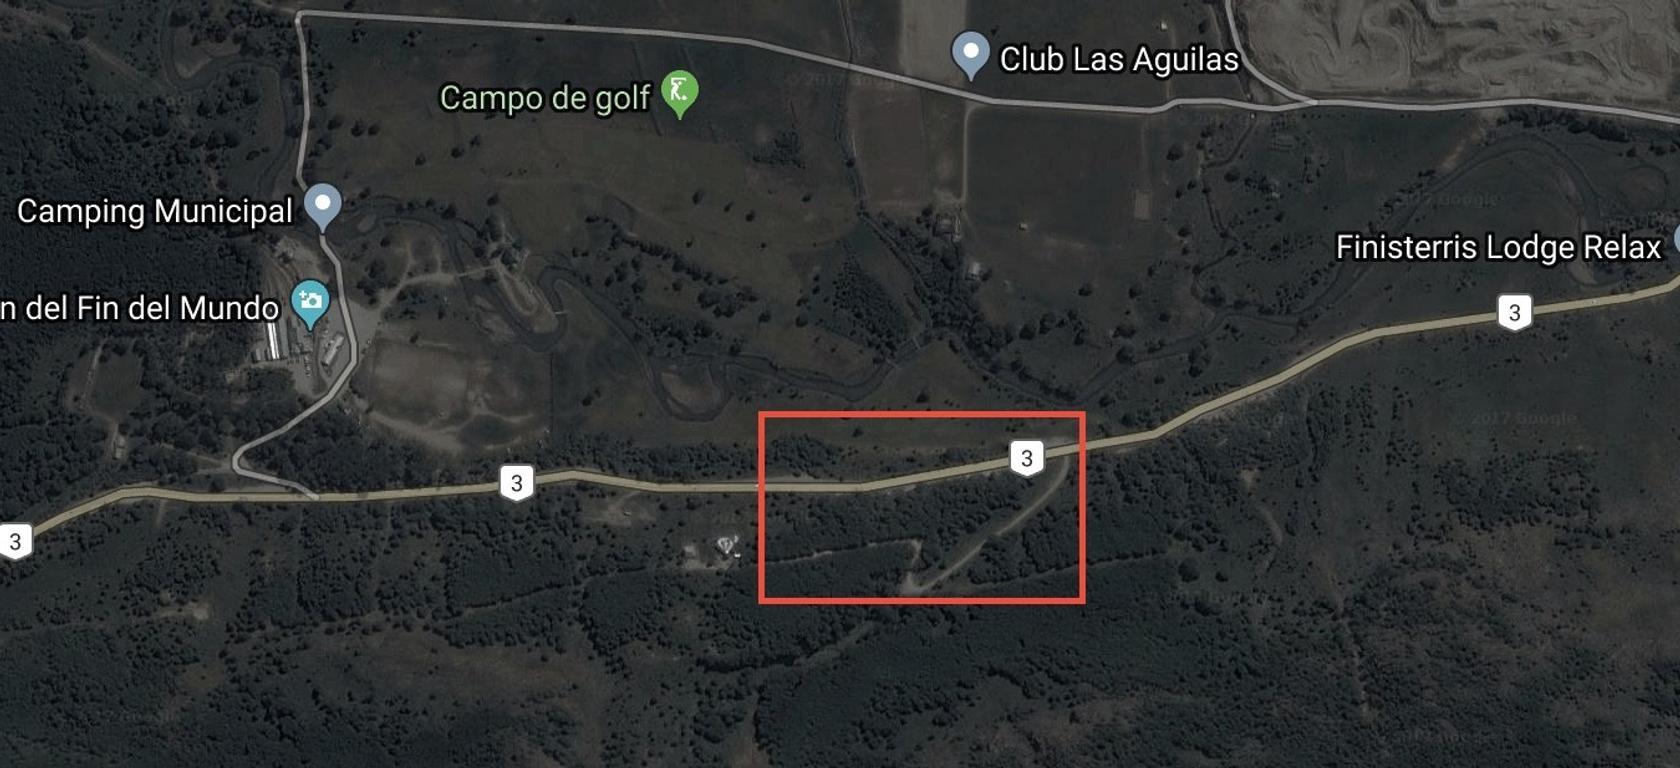 Terrenos frente a Canchas de Golf. Oportunidad para Inversión Turística